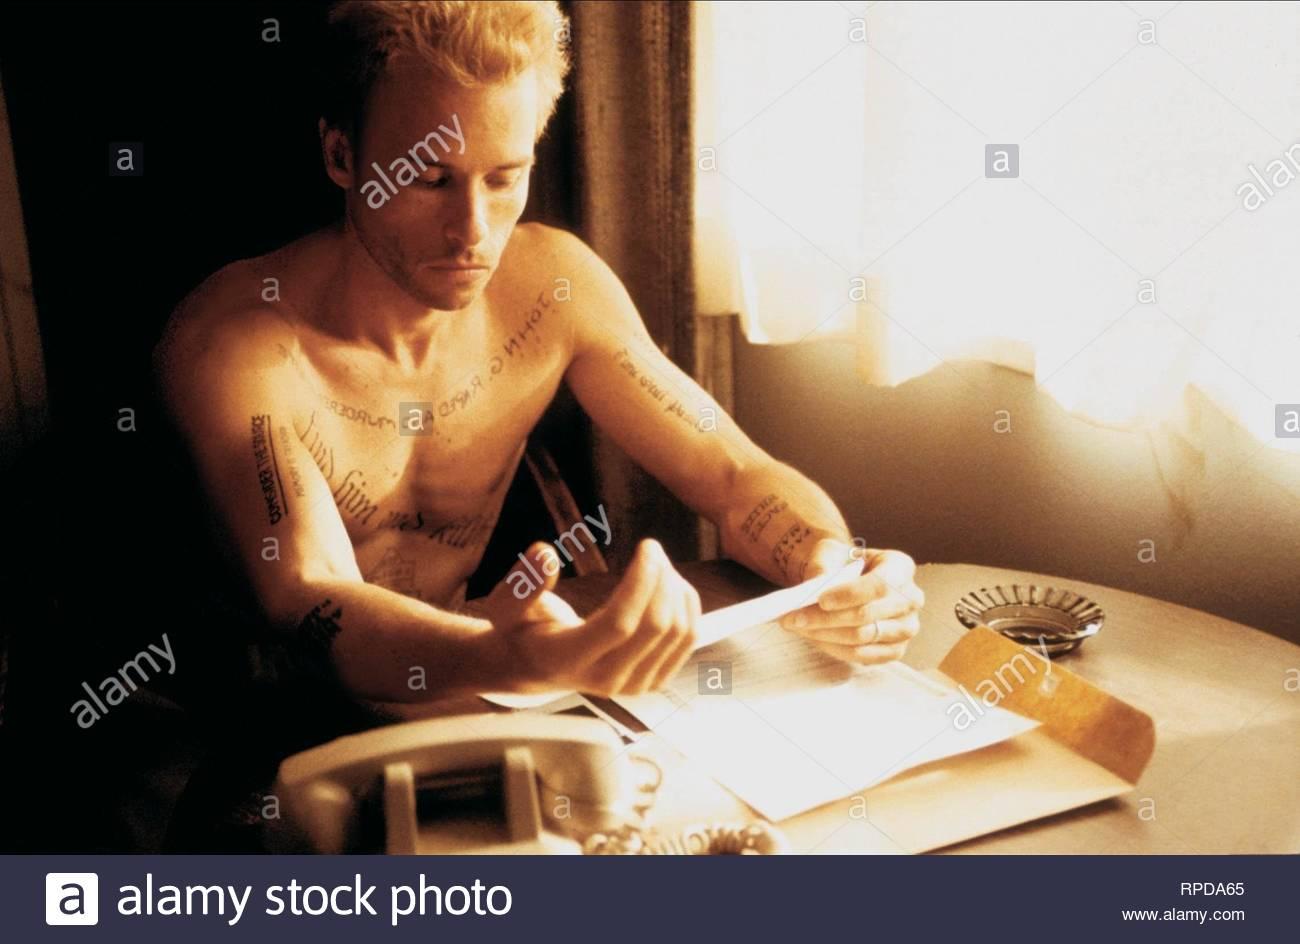 GUY PEARCE, MEMENTO, 2000 - Stock Image